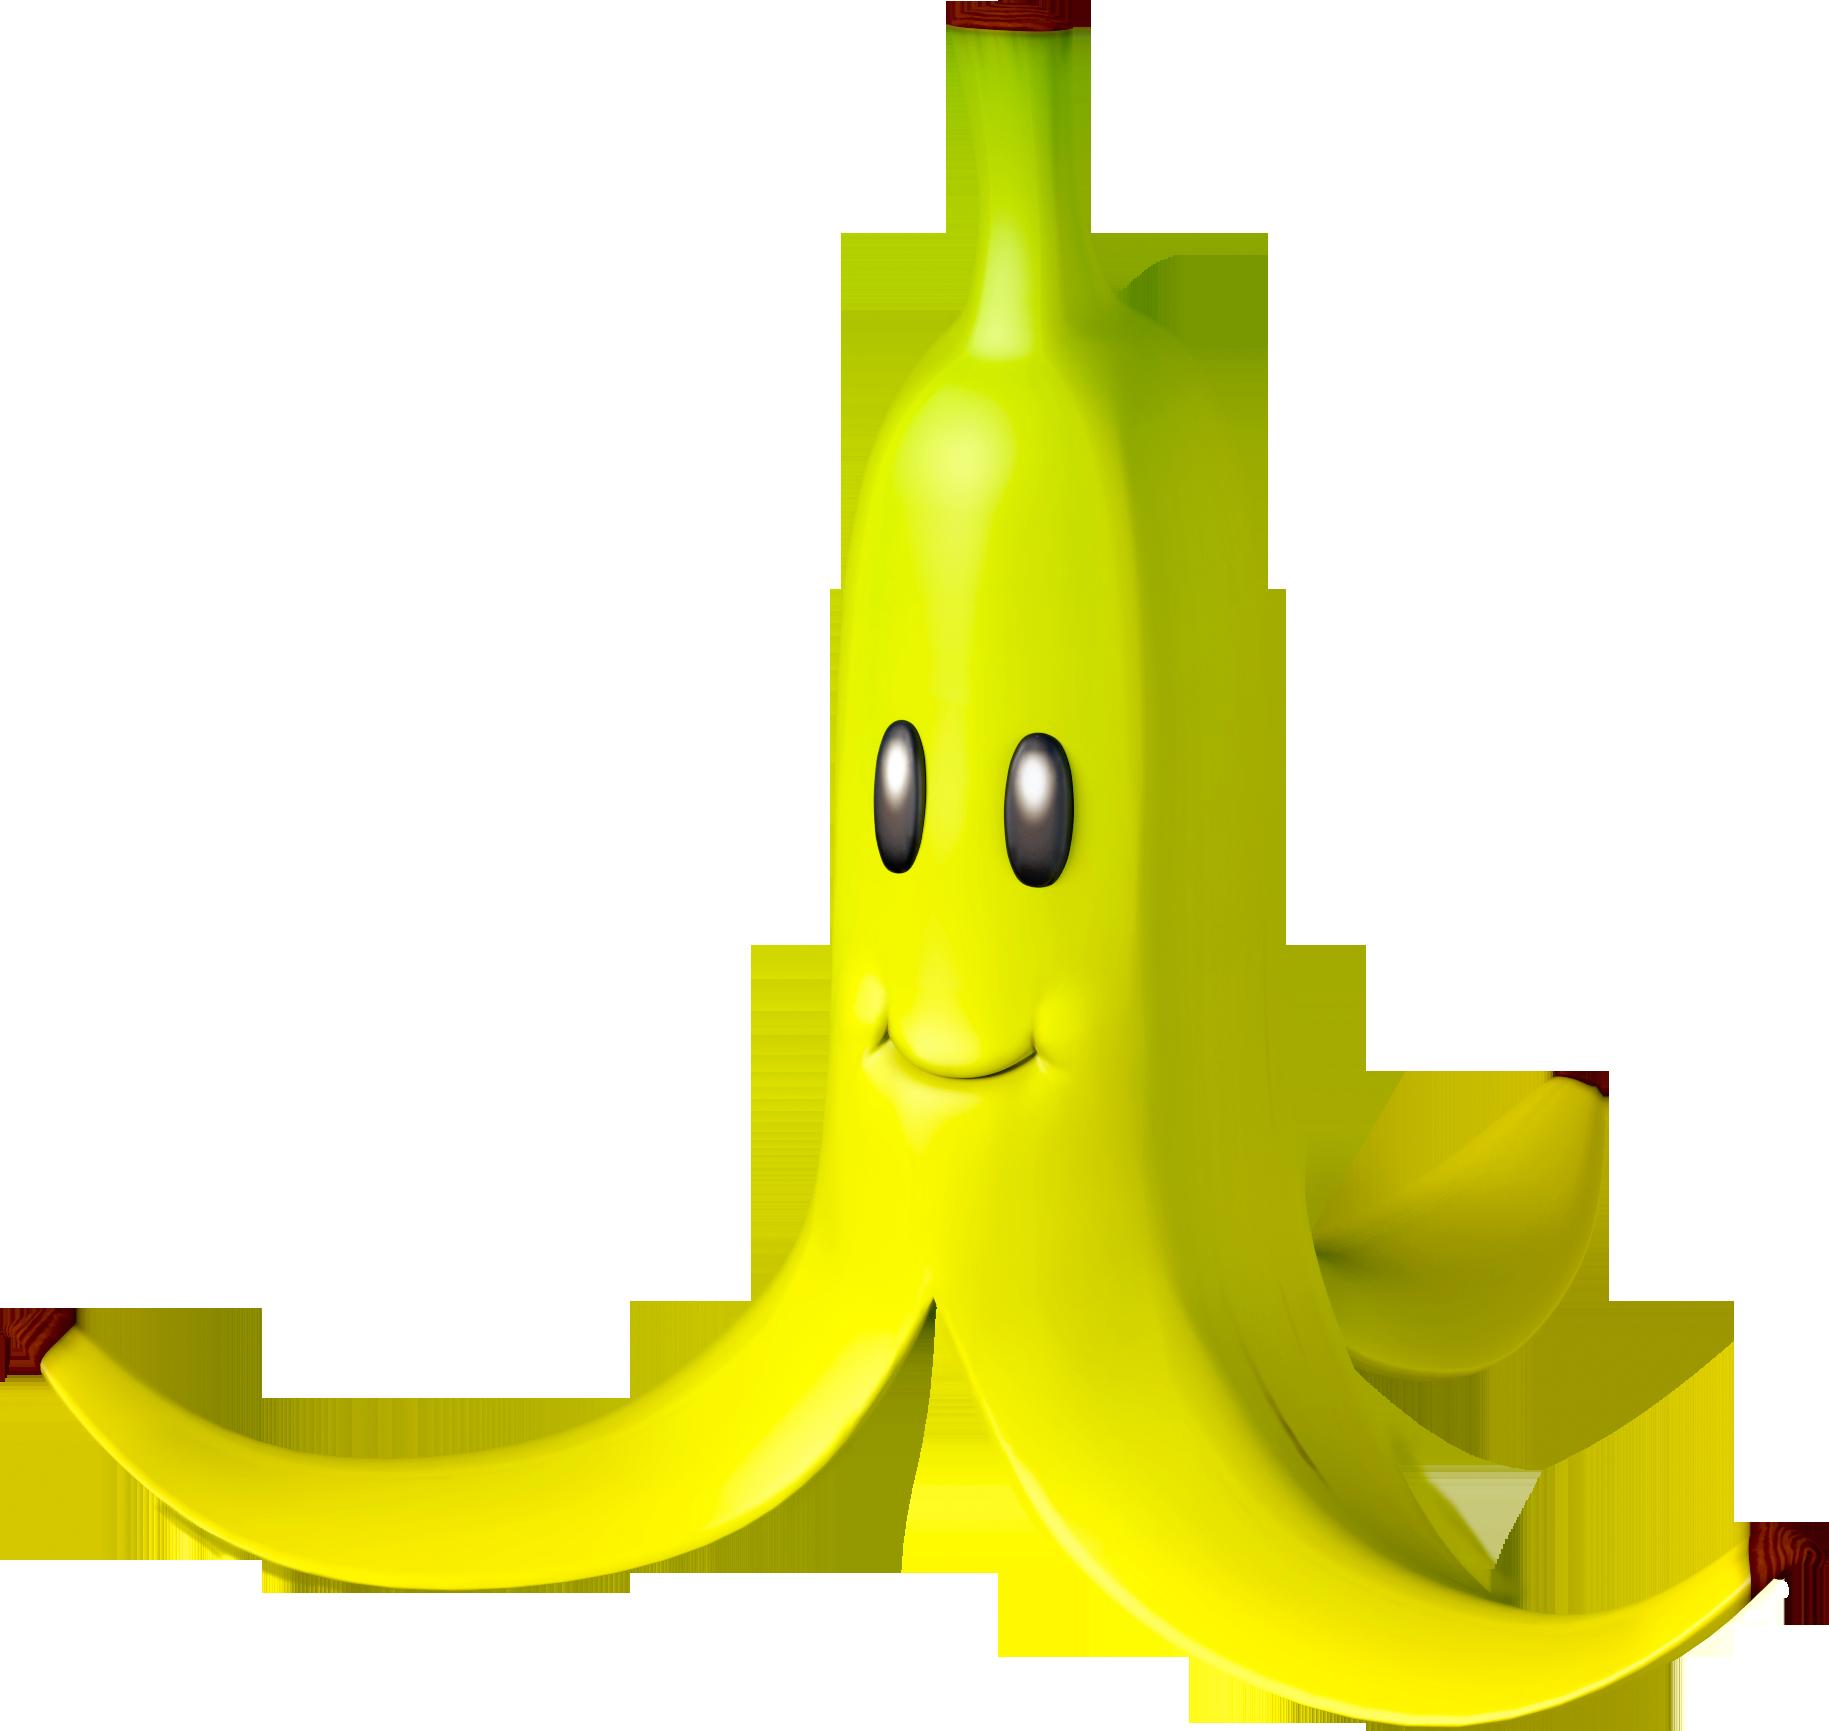 Banana peel transparent - photo#10